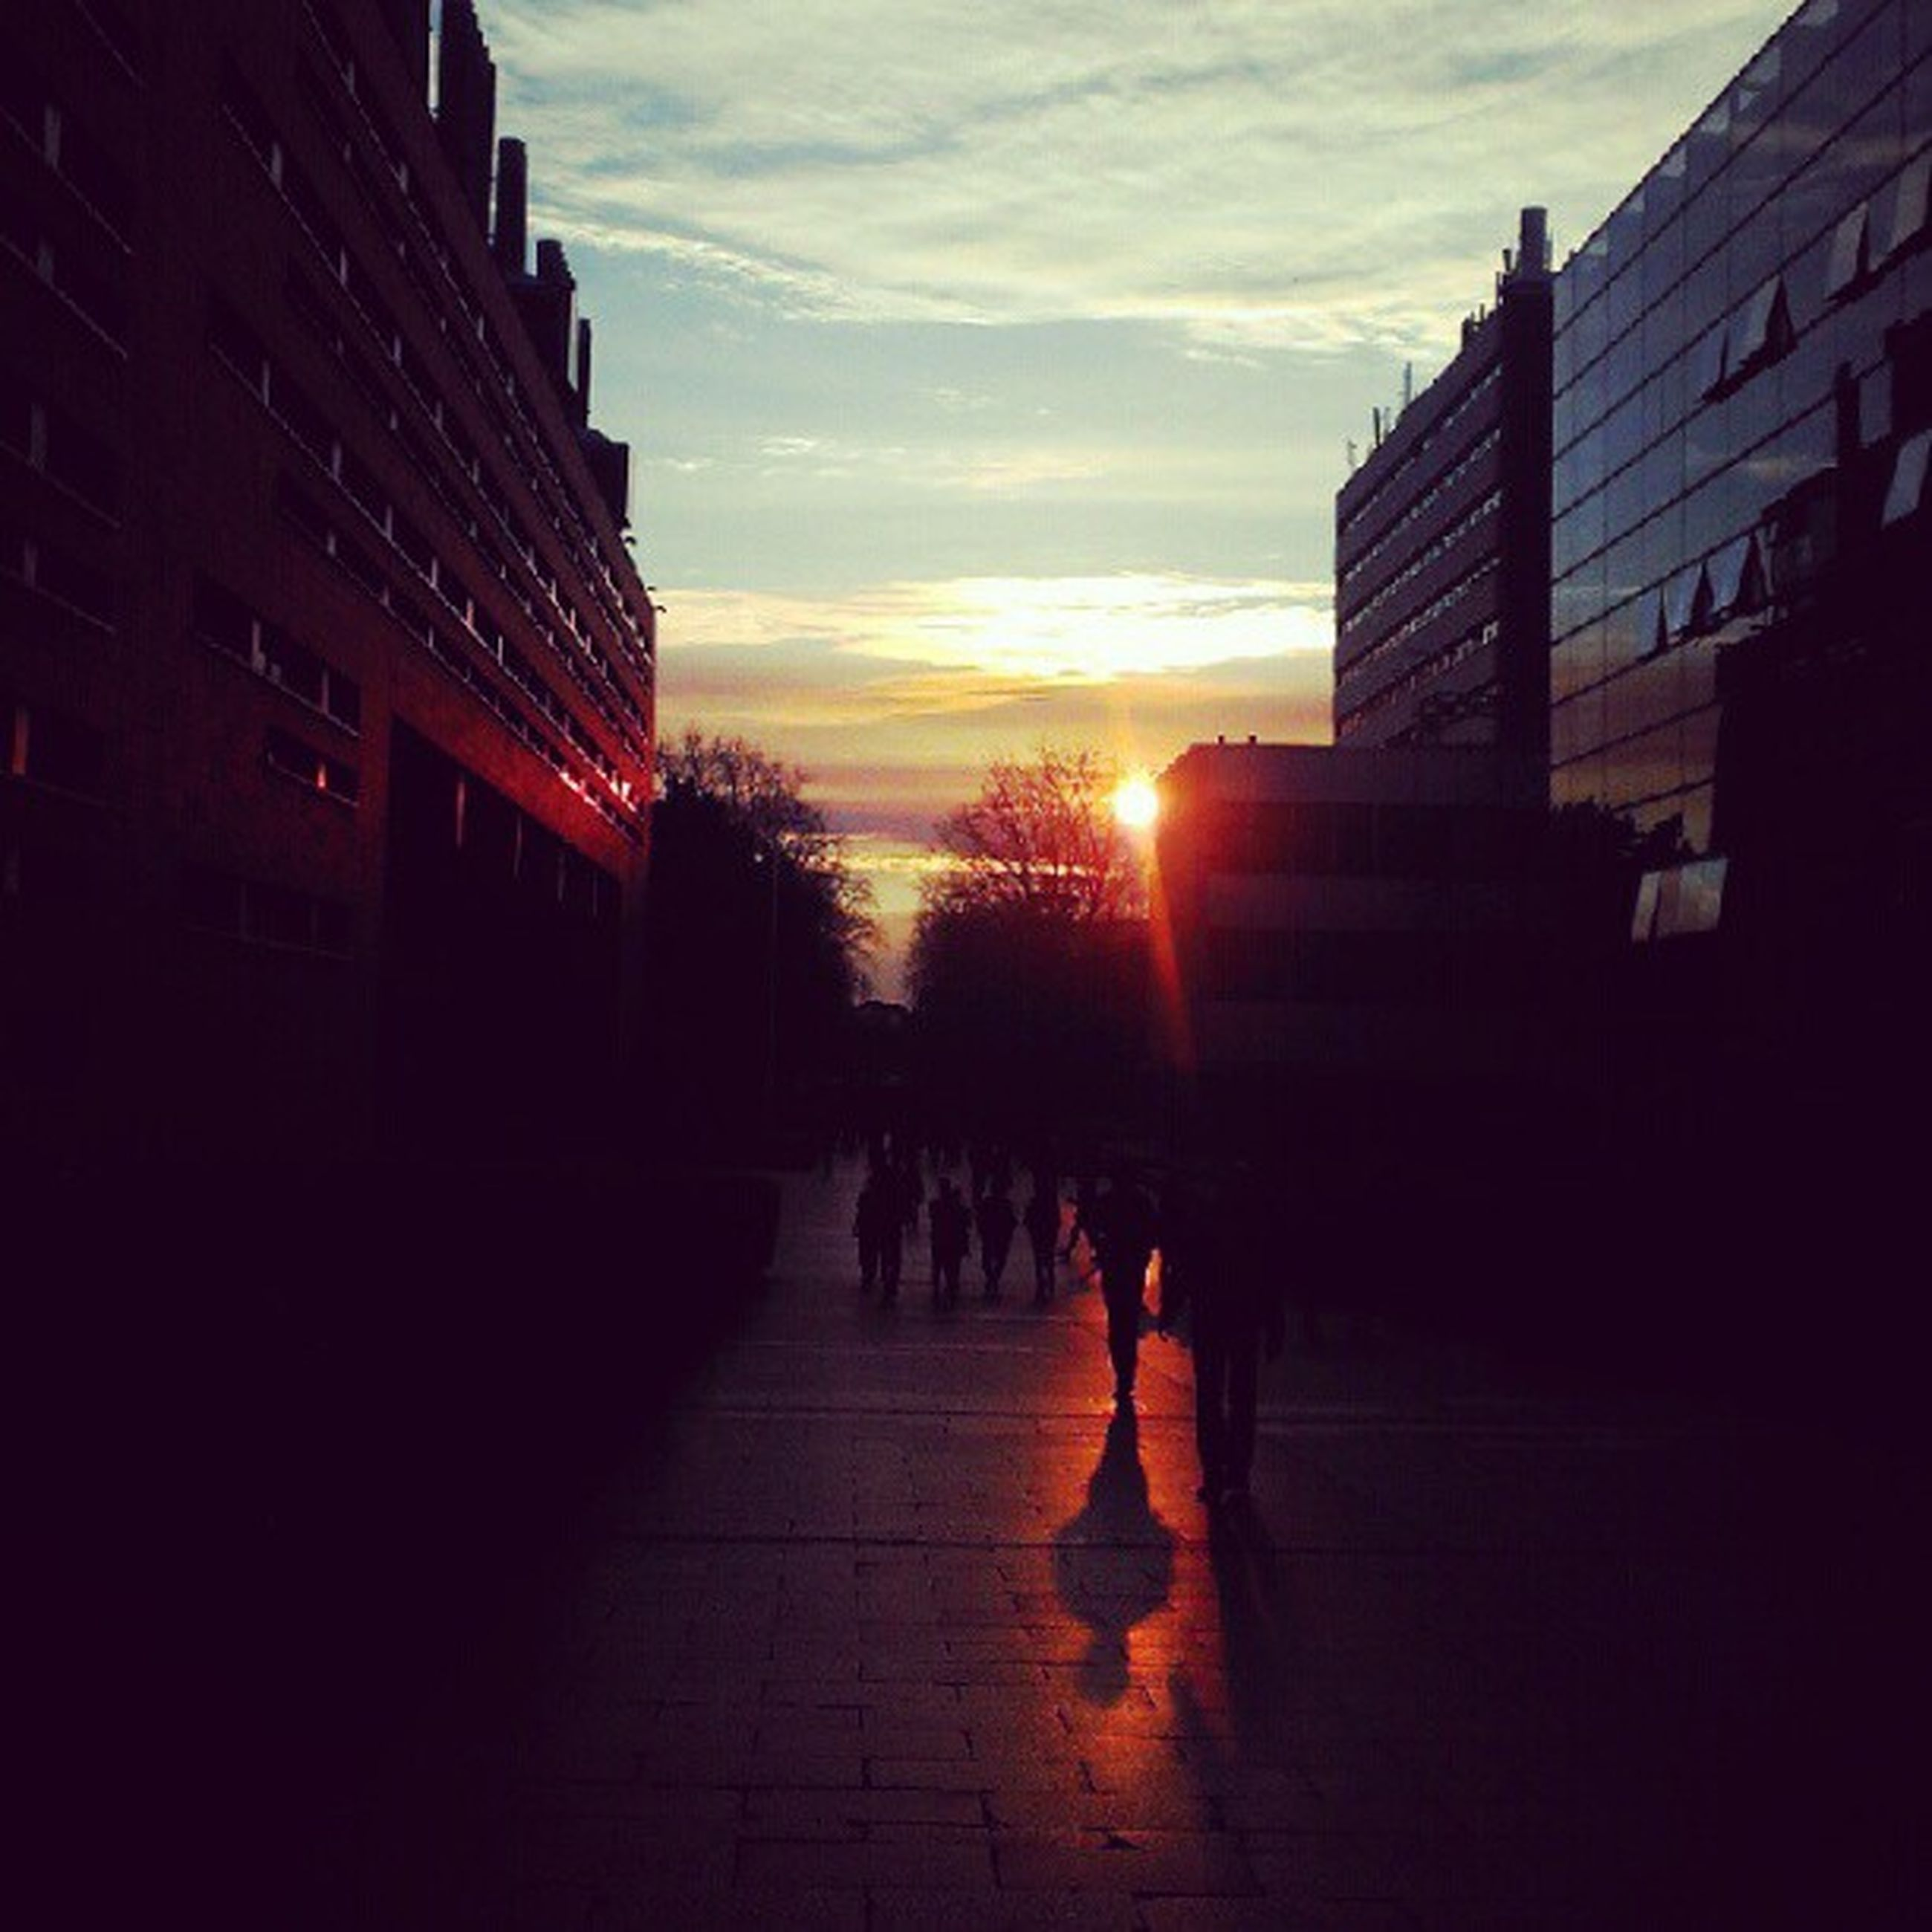 sunset, architecture, building exterior, built structure, sun, orange color, sky, city, sunlight, lifestyles, men, silhouette, walking, person, city life, cloud - sky, street, sunbeam, reflection